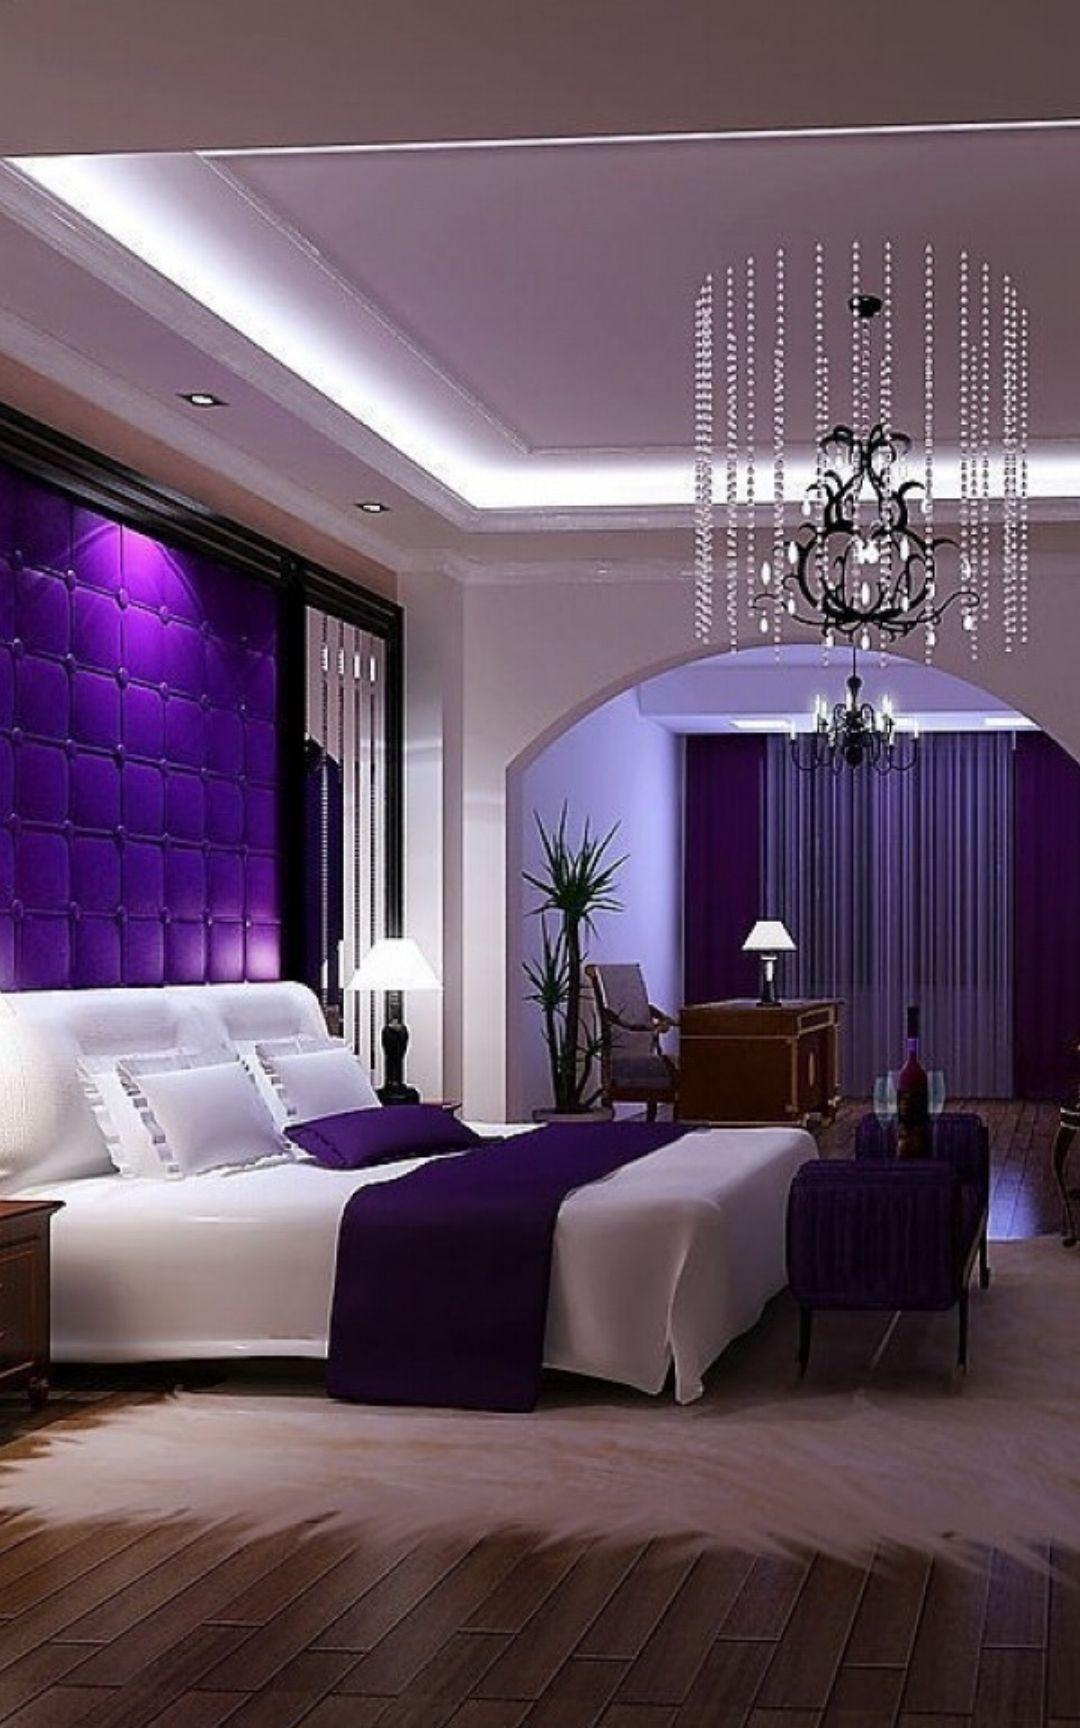 Romantic bedroom master bedroom bedroom decor ideas   Gorgeous Master Bedroom Designs  Purple master bedroom Master